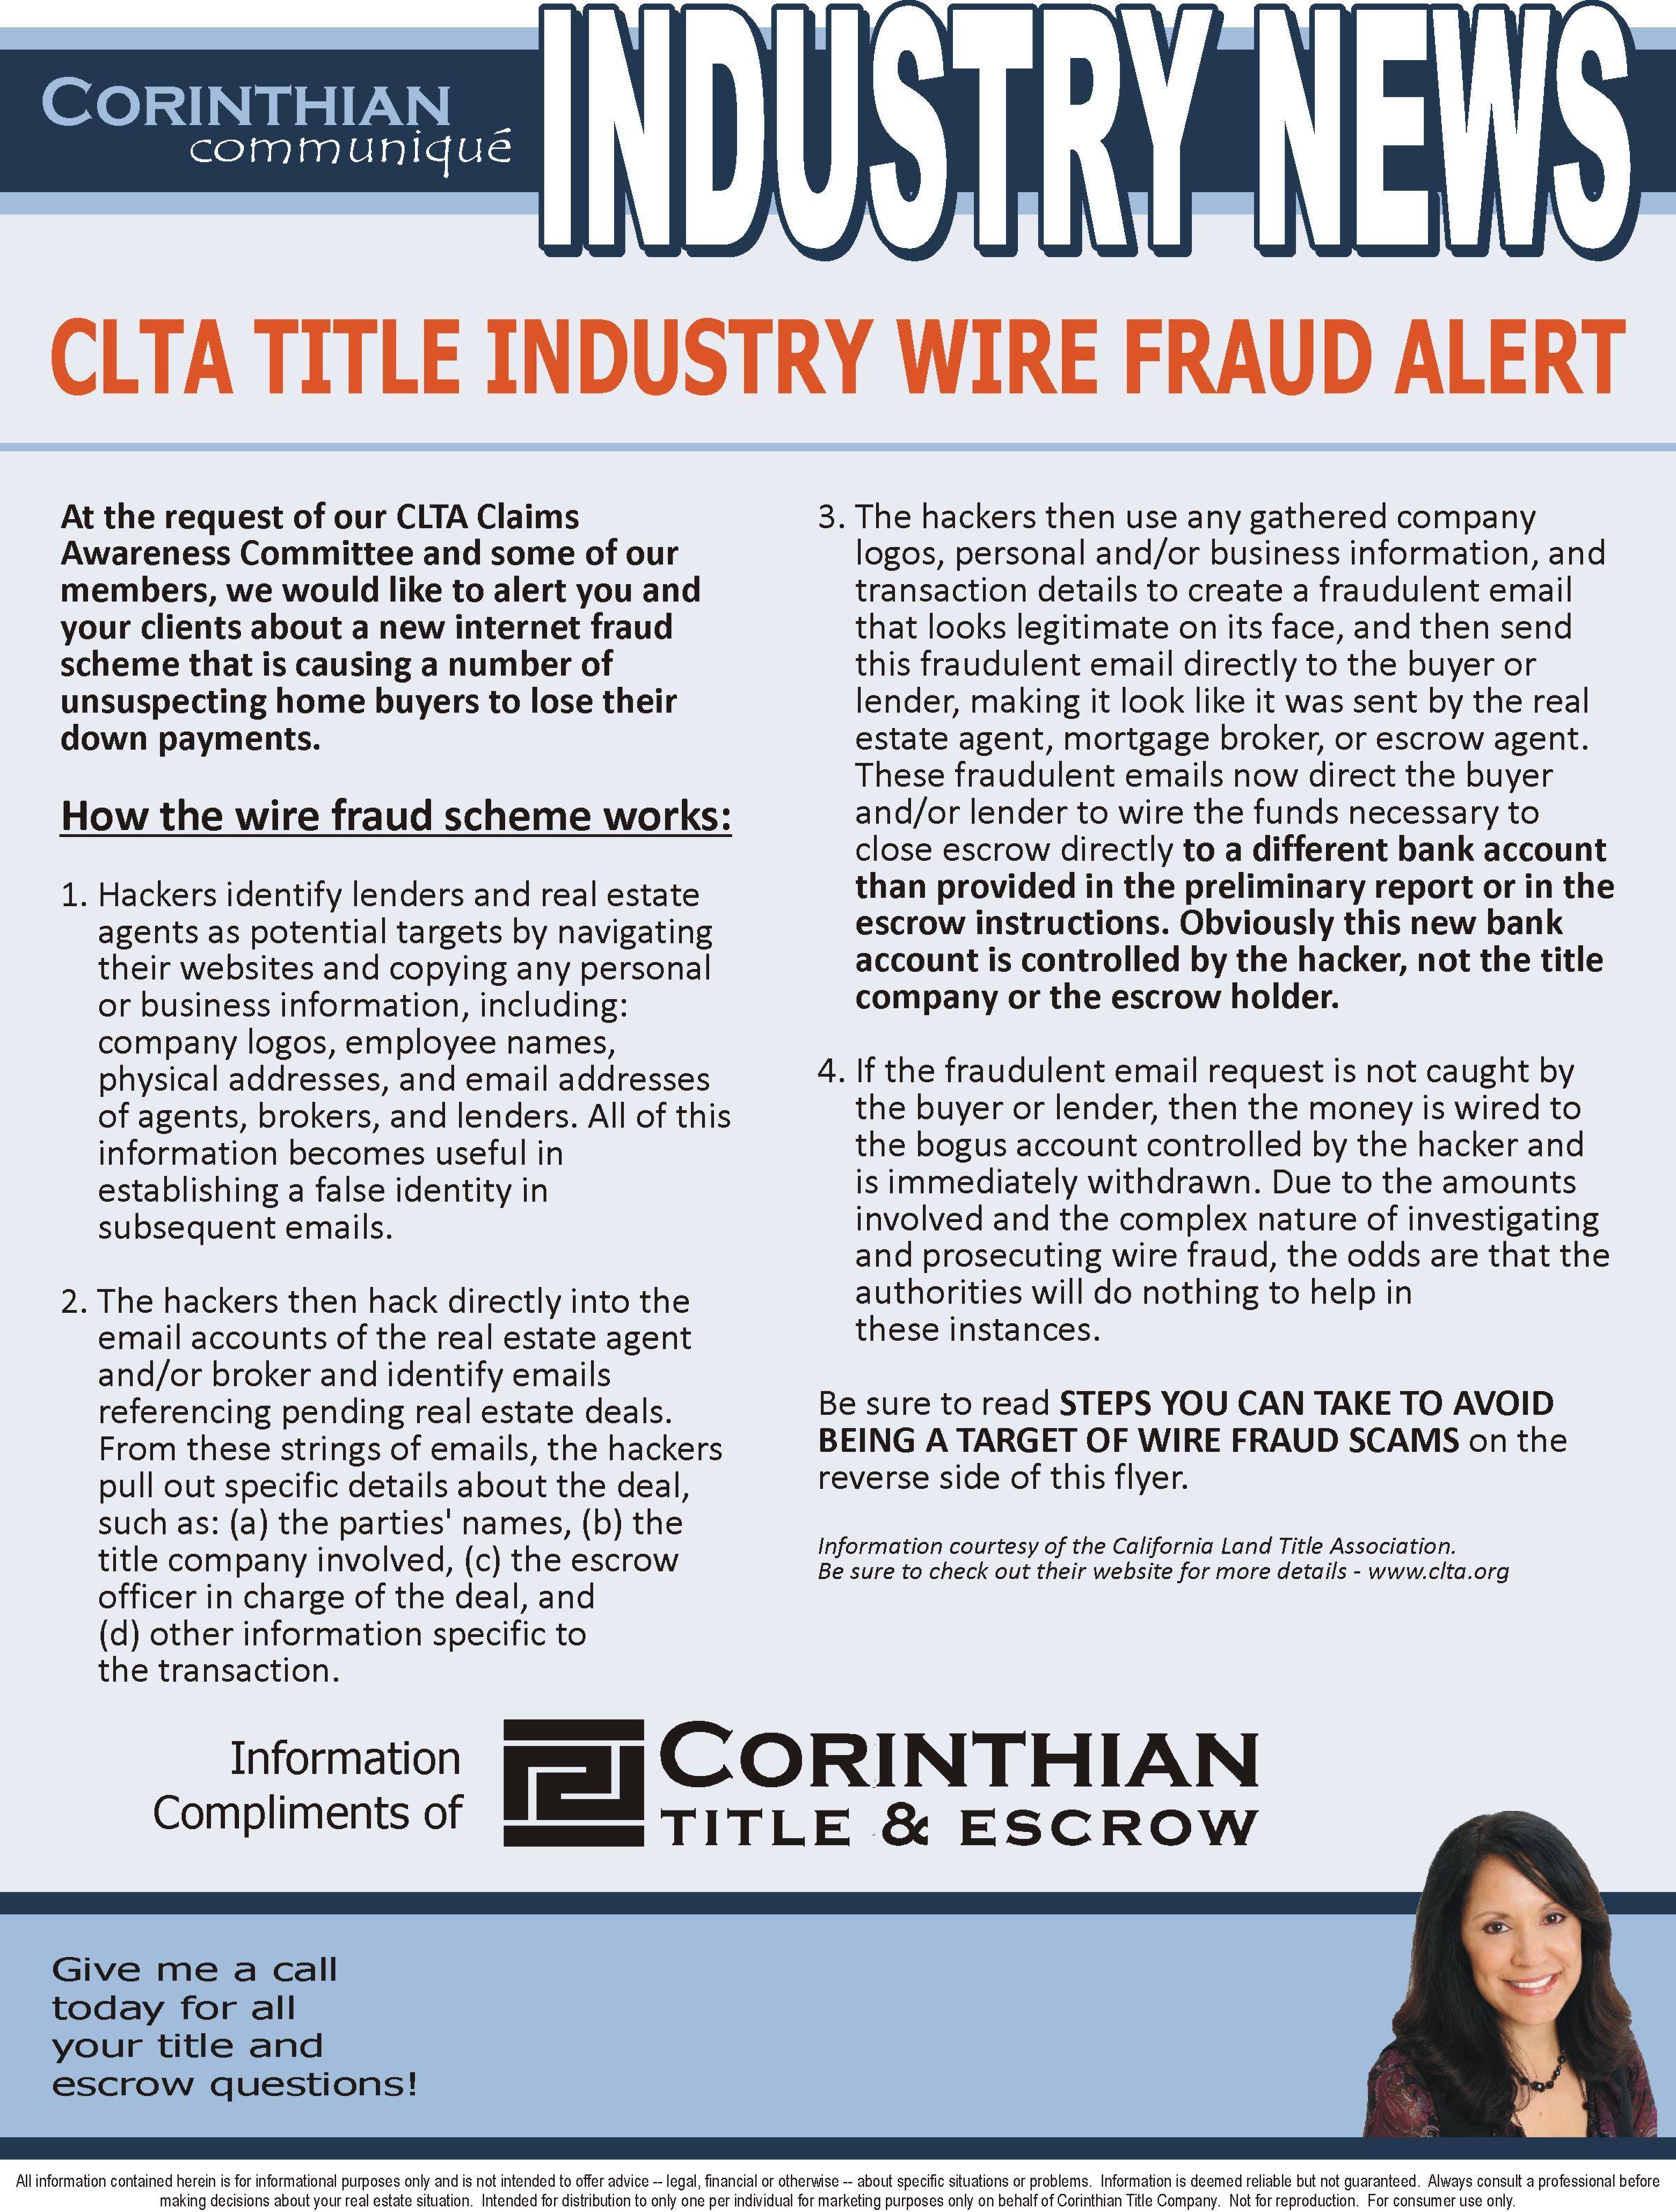 Wire Fraud Alert https://corinthiantitle.com/directory/carmen-vinti ...